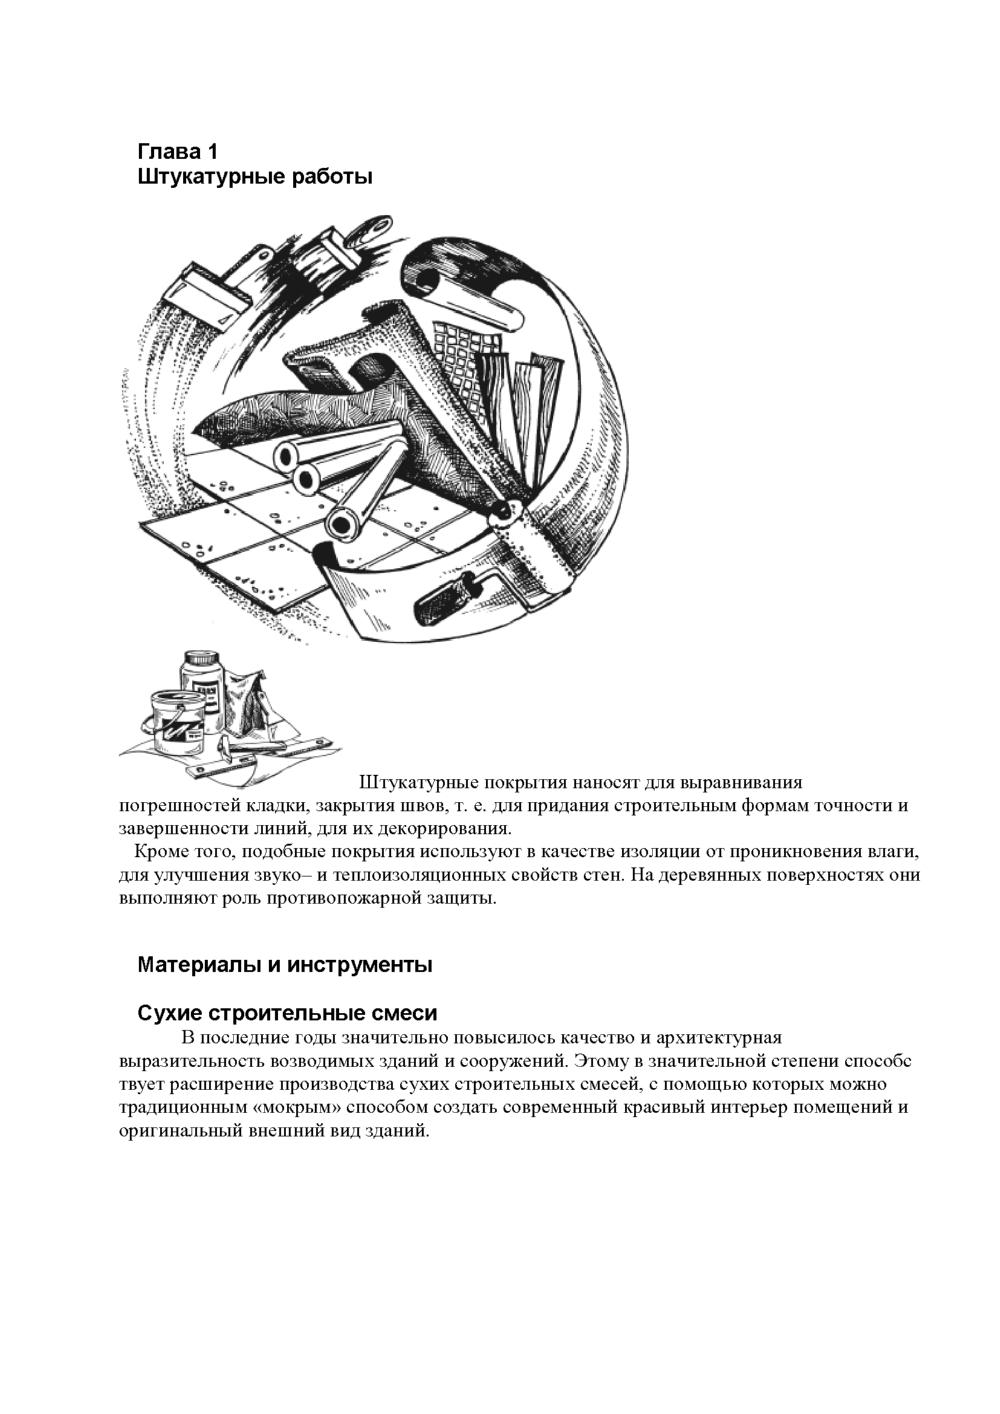 http://i1.imageban.ru/out/2013/11/26/de9768aa5967c04f4912fca51d929b9c.jpg